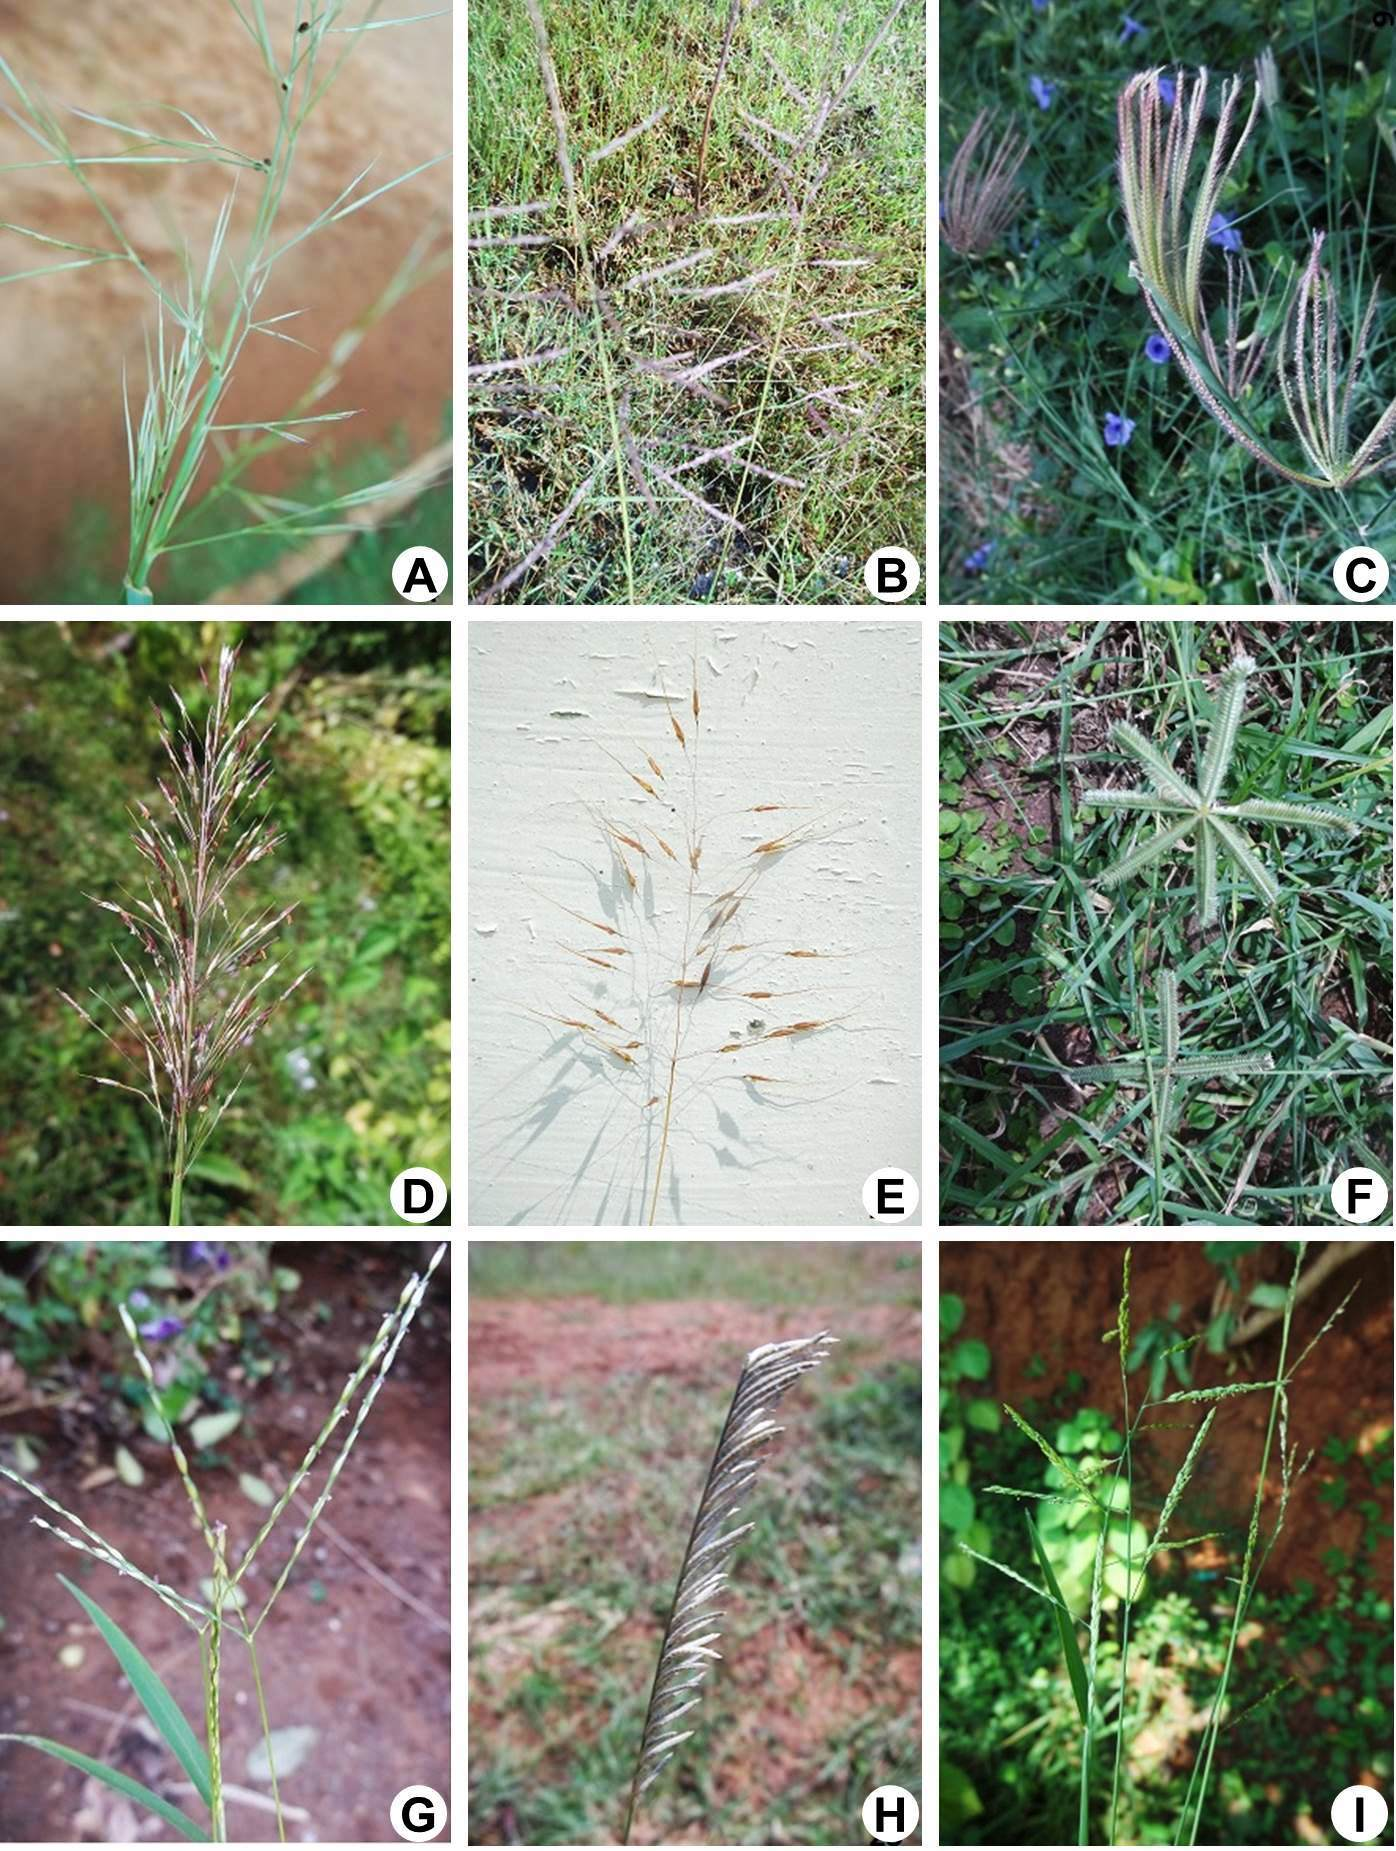 A, Aristida hystrix L.f.; B, Capillipedium  assimile (Steud.) A. Camus.; C, Chloris barbata Sw.; D, Chrysopogon aciculatus (Retz.) Trin.; E, Chrysopogon orientalis (Desv.) A. Camus.; F, Dactyloctenium aegyptium (L.) Willd.; G, Digitaria ciliaris (Retz.) Koeler.; H, Eragrostiella bifaria (Vahl) Bor.; I, Eriochloa procera (Retz) C.E. Hubb.